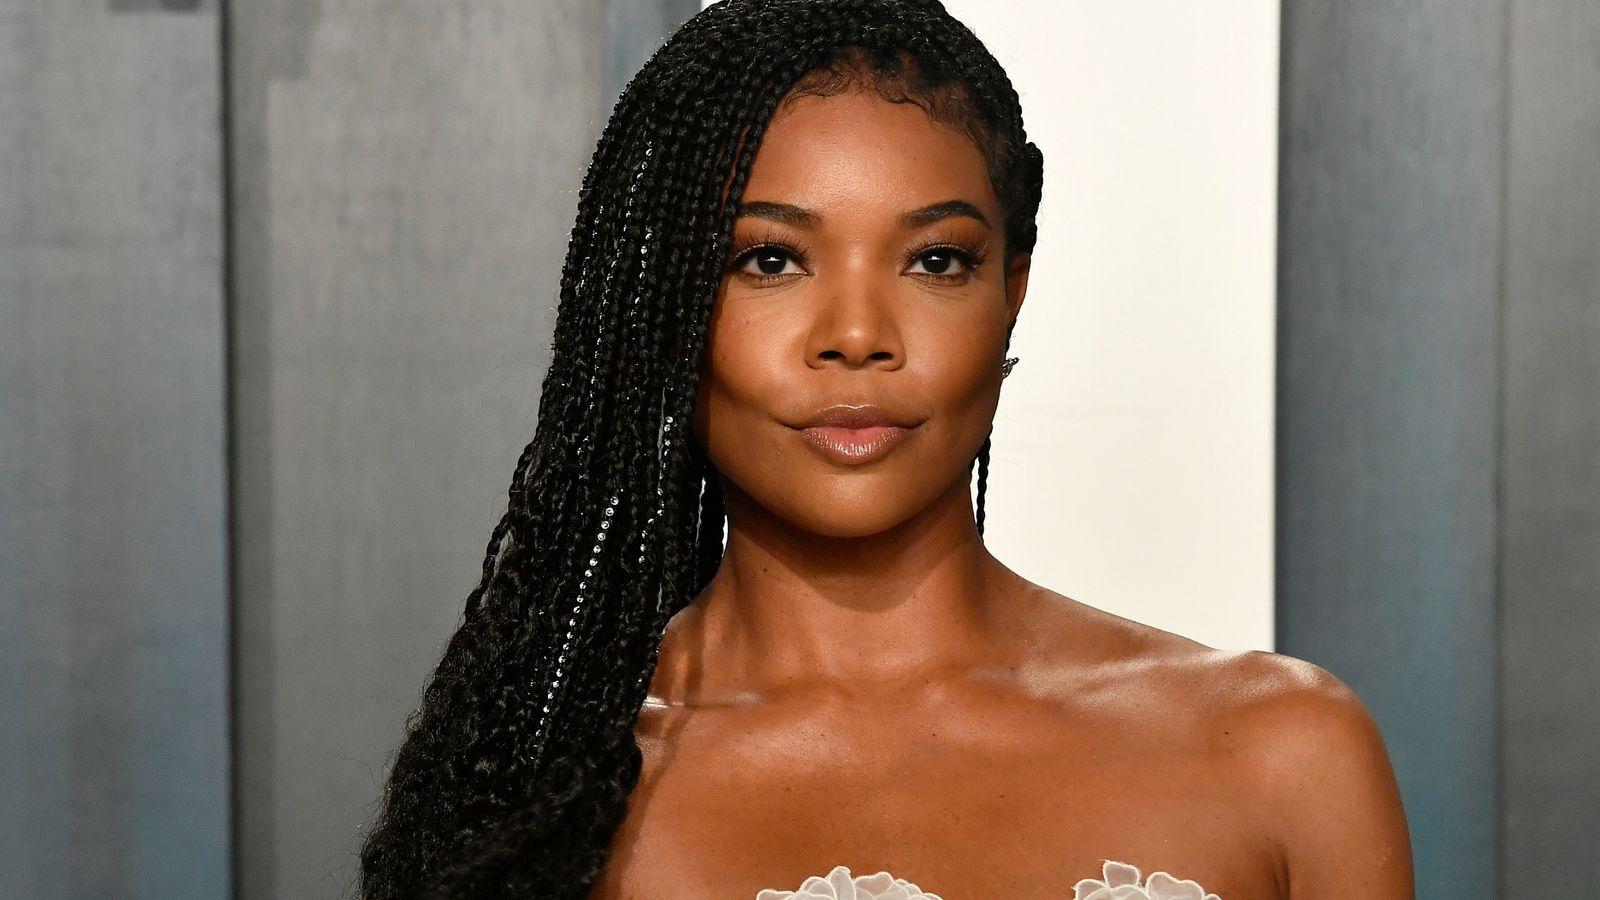 Friends: Gabrielle Union to host famous episode re-enactment with all-black cast